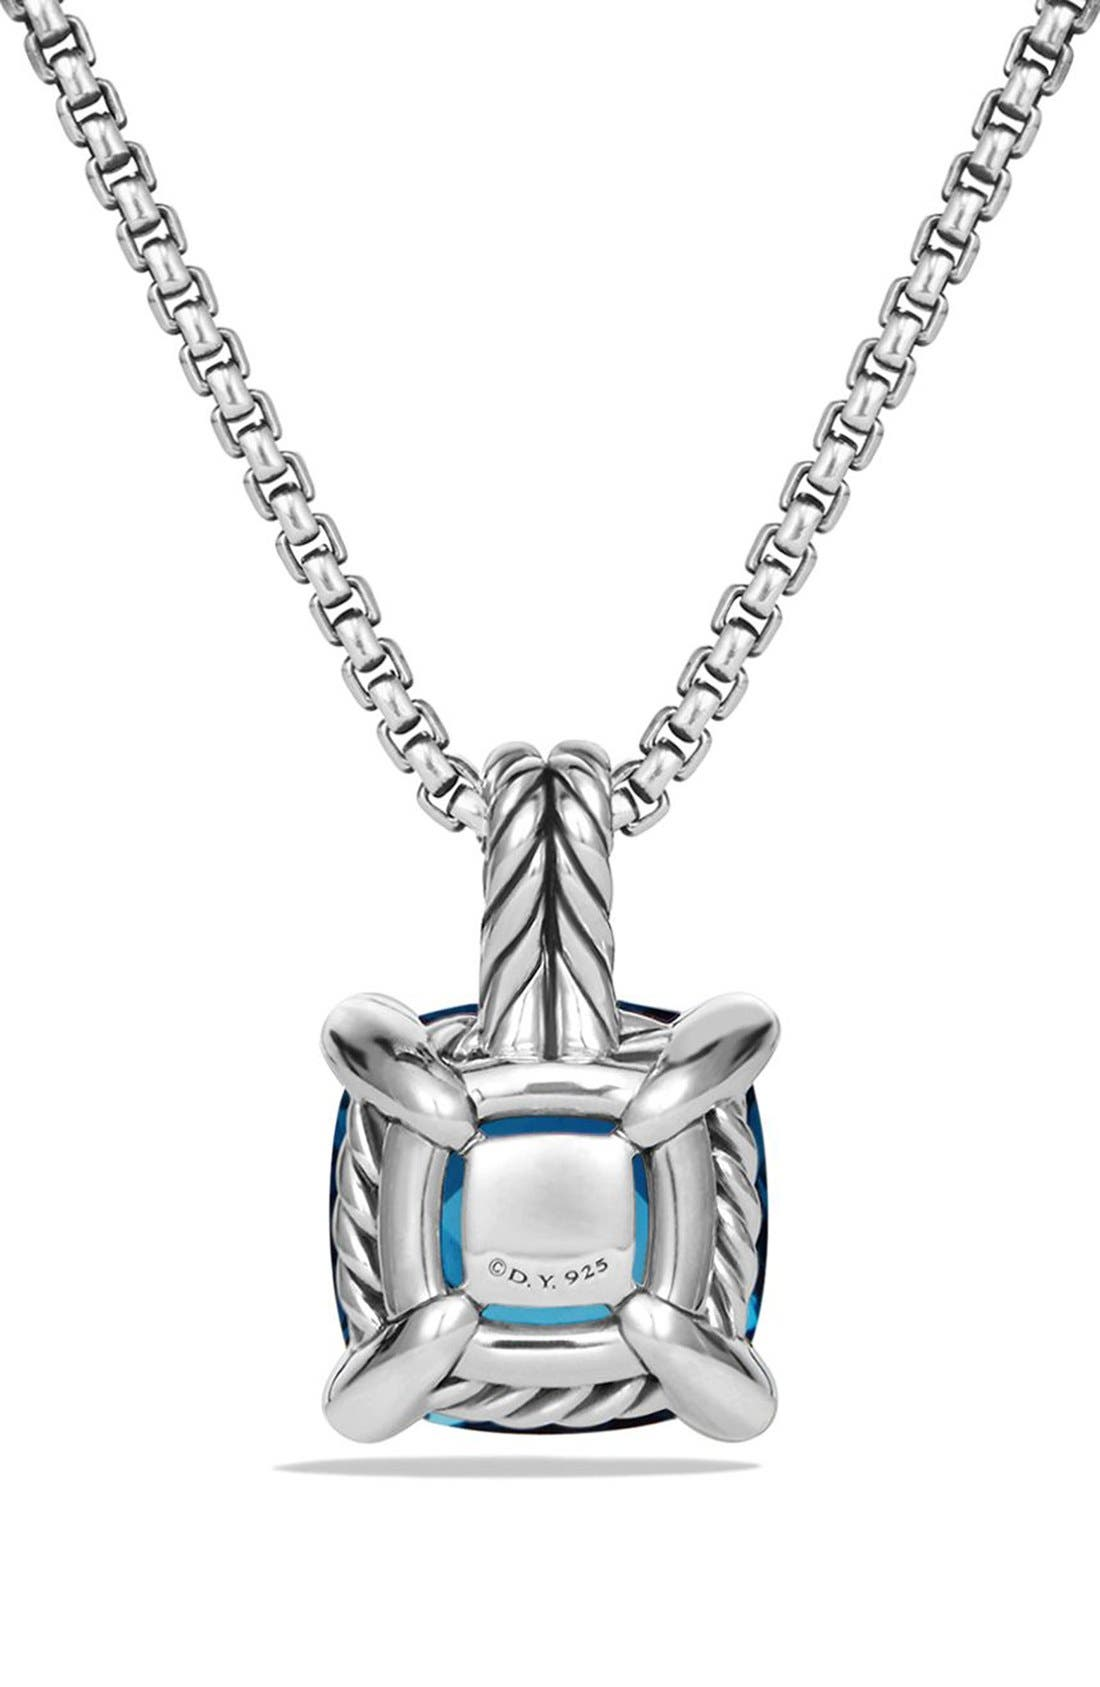 'Châtelaine' Pendant Necklace with Semiprecious Stone & Diamonds,                             Alternate thumbnail 4, color,                             SILVER/ HAMPTON BLUE TOPAZ